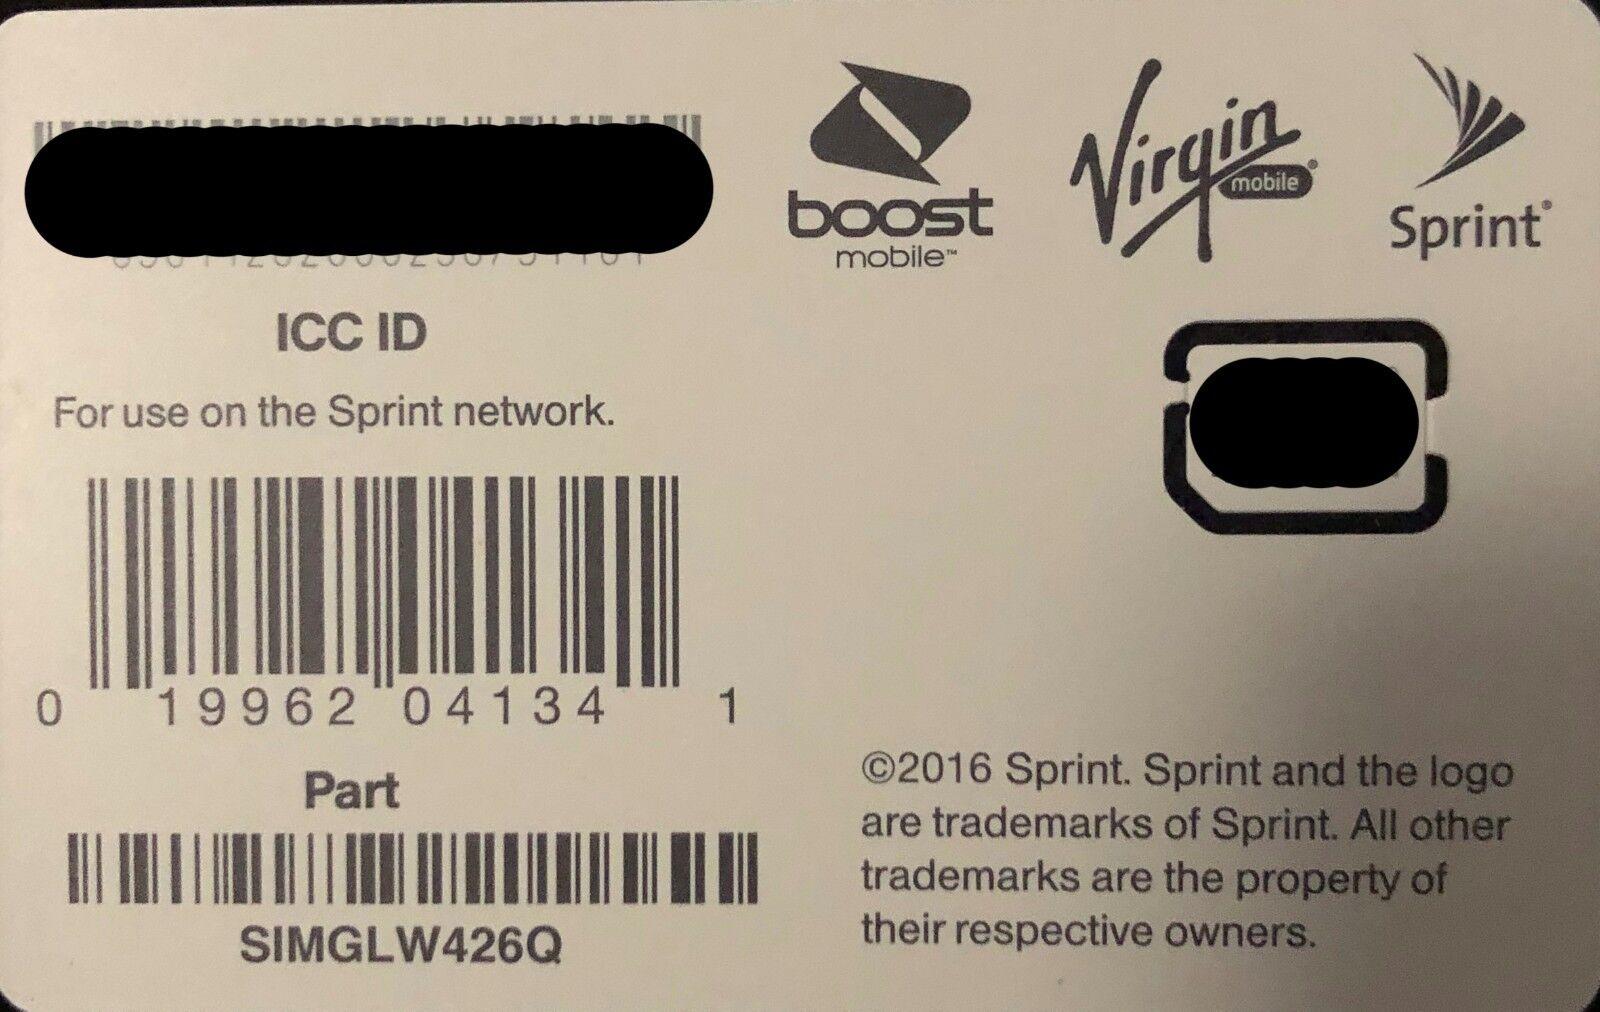 SPRINT BOOST VIRGIN MOBILE NANO SIM CARD ICCID SIMGLW426Q iP